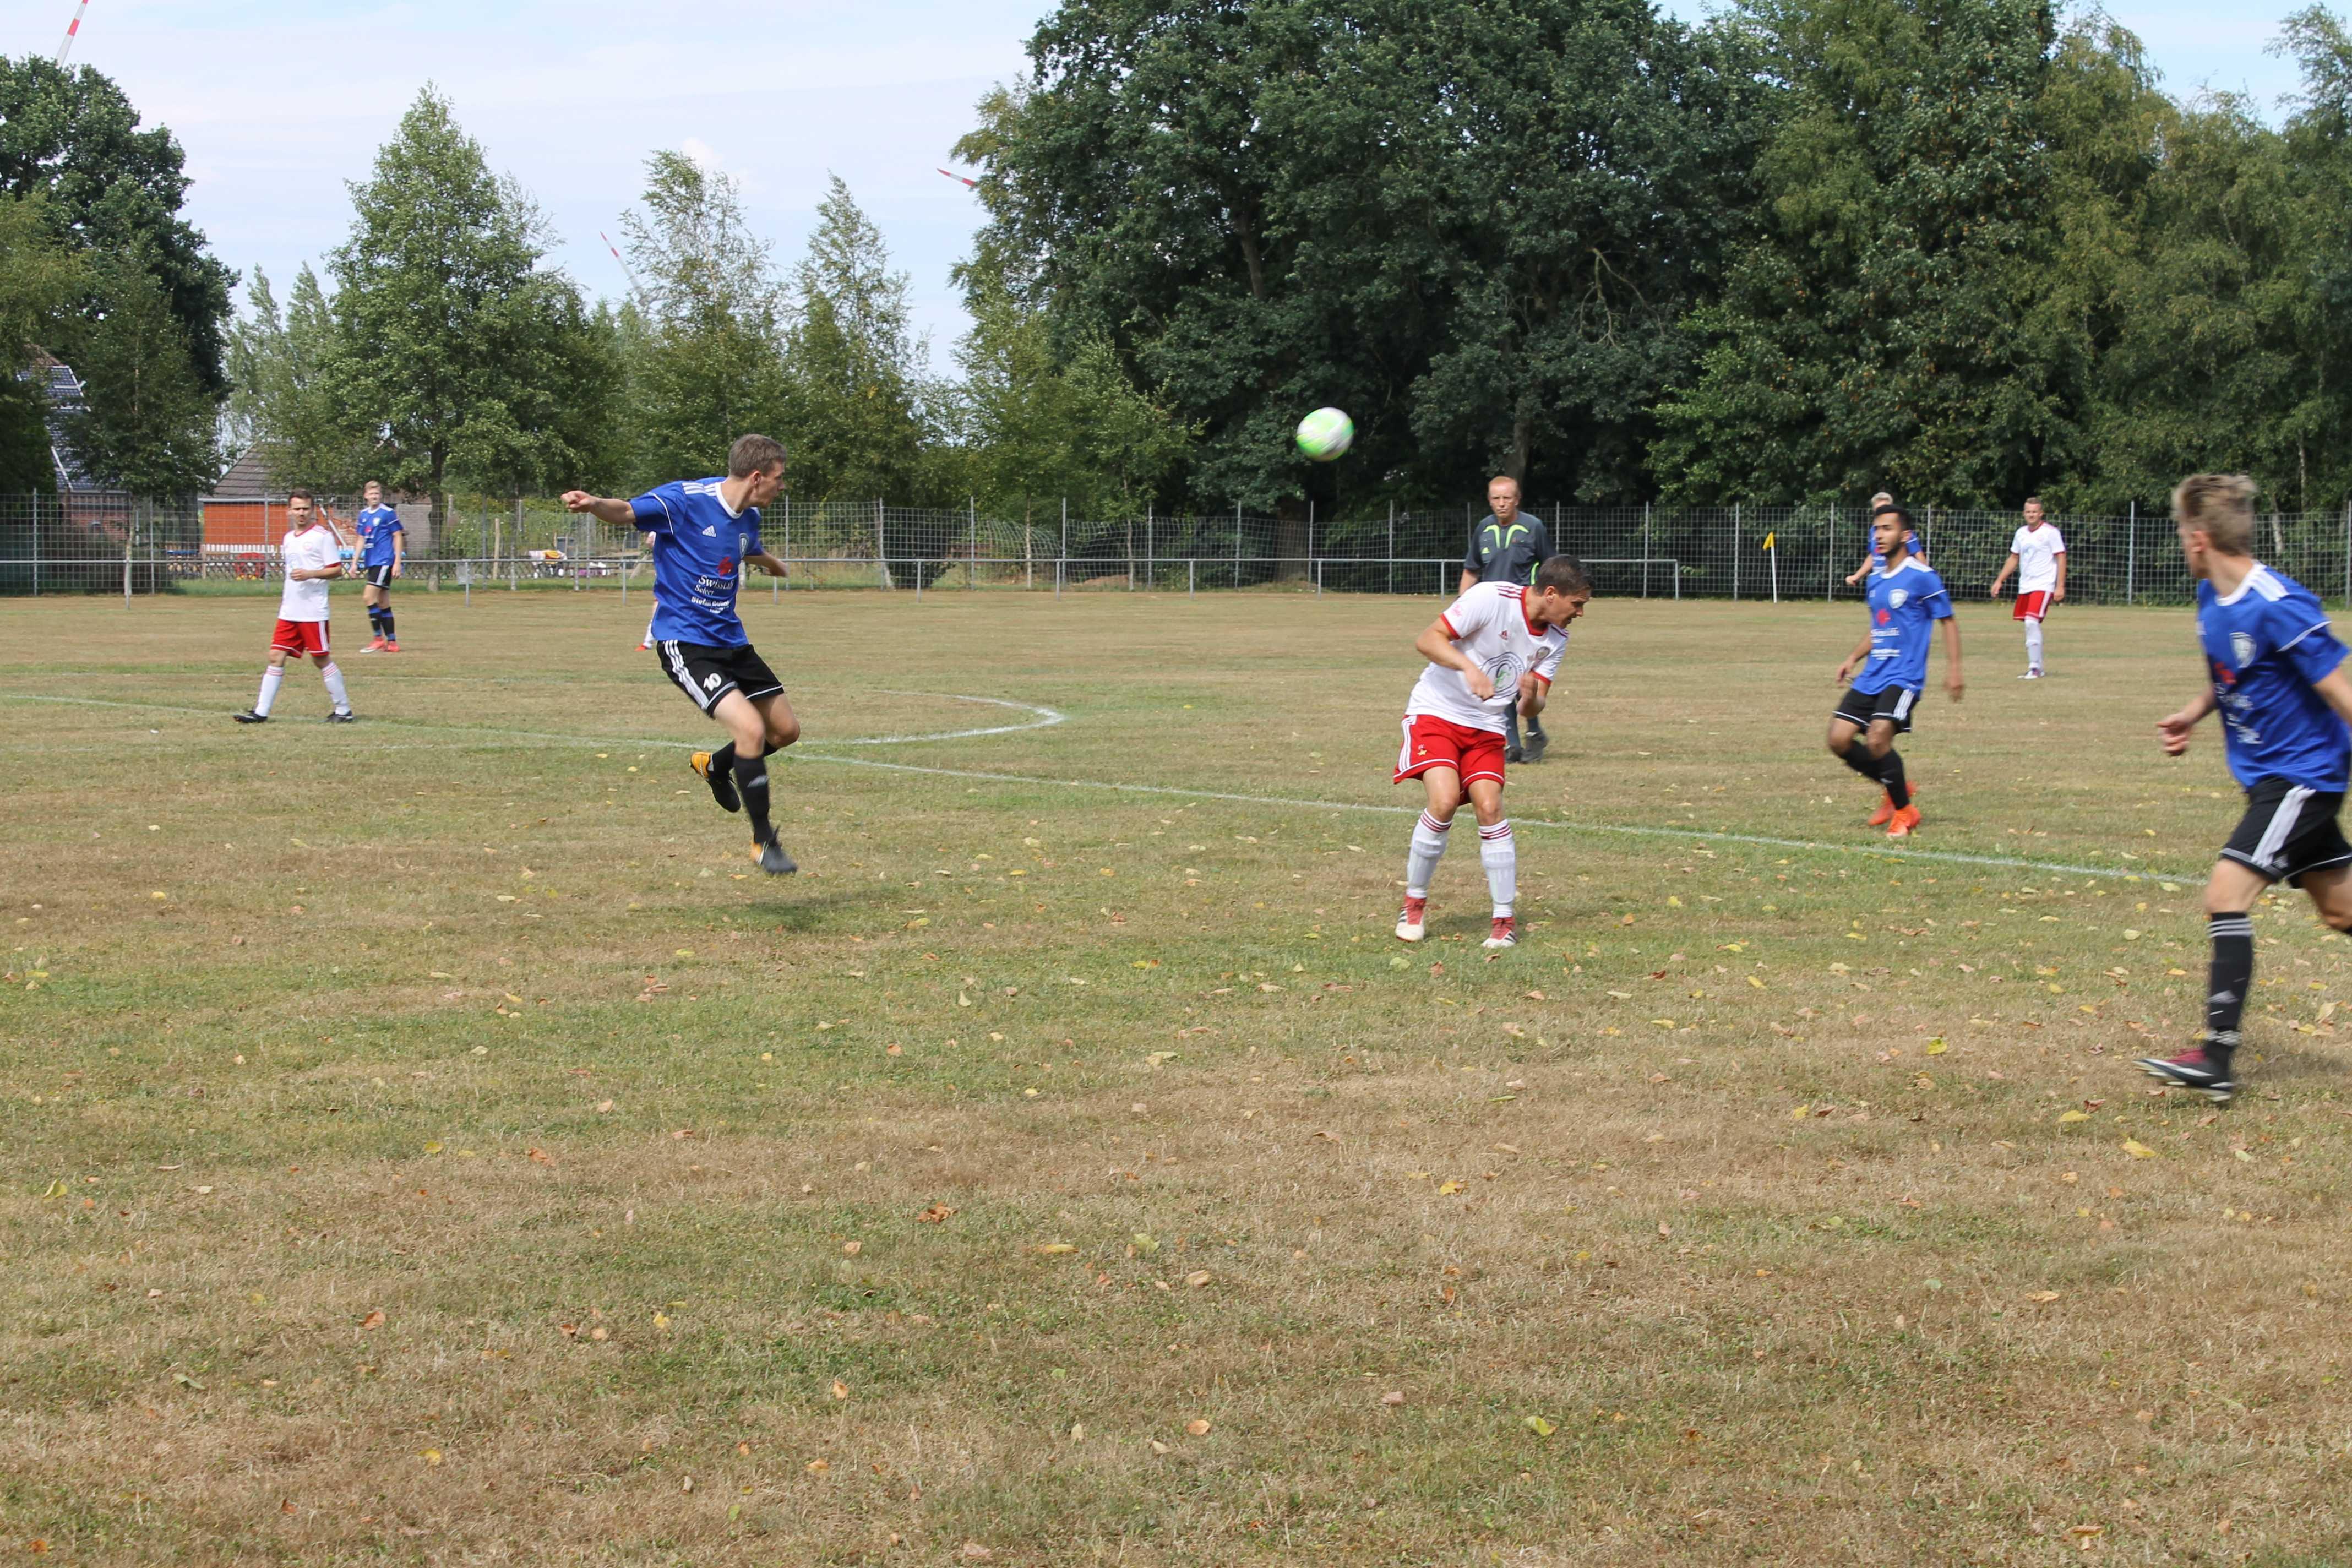 2018-07-29 Sportwoche - Sportpicknick & Football & Fußball (40)